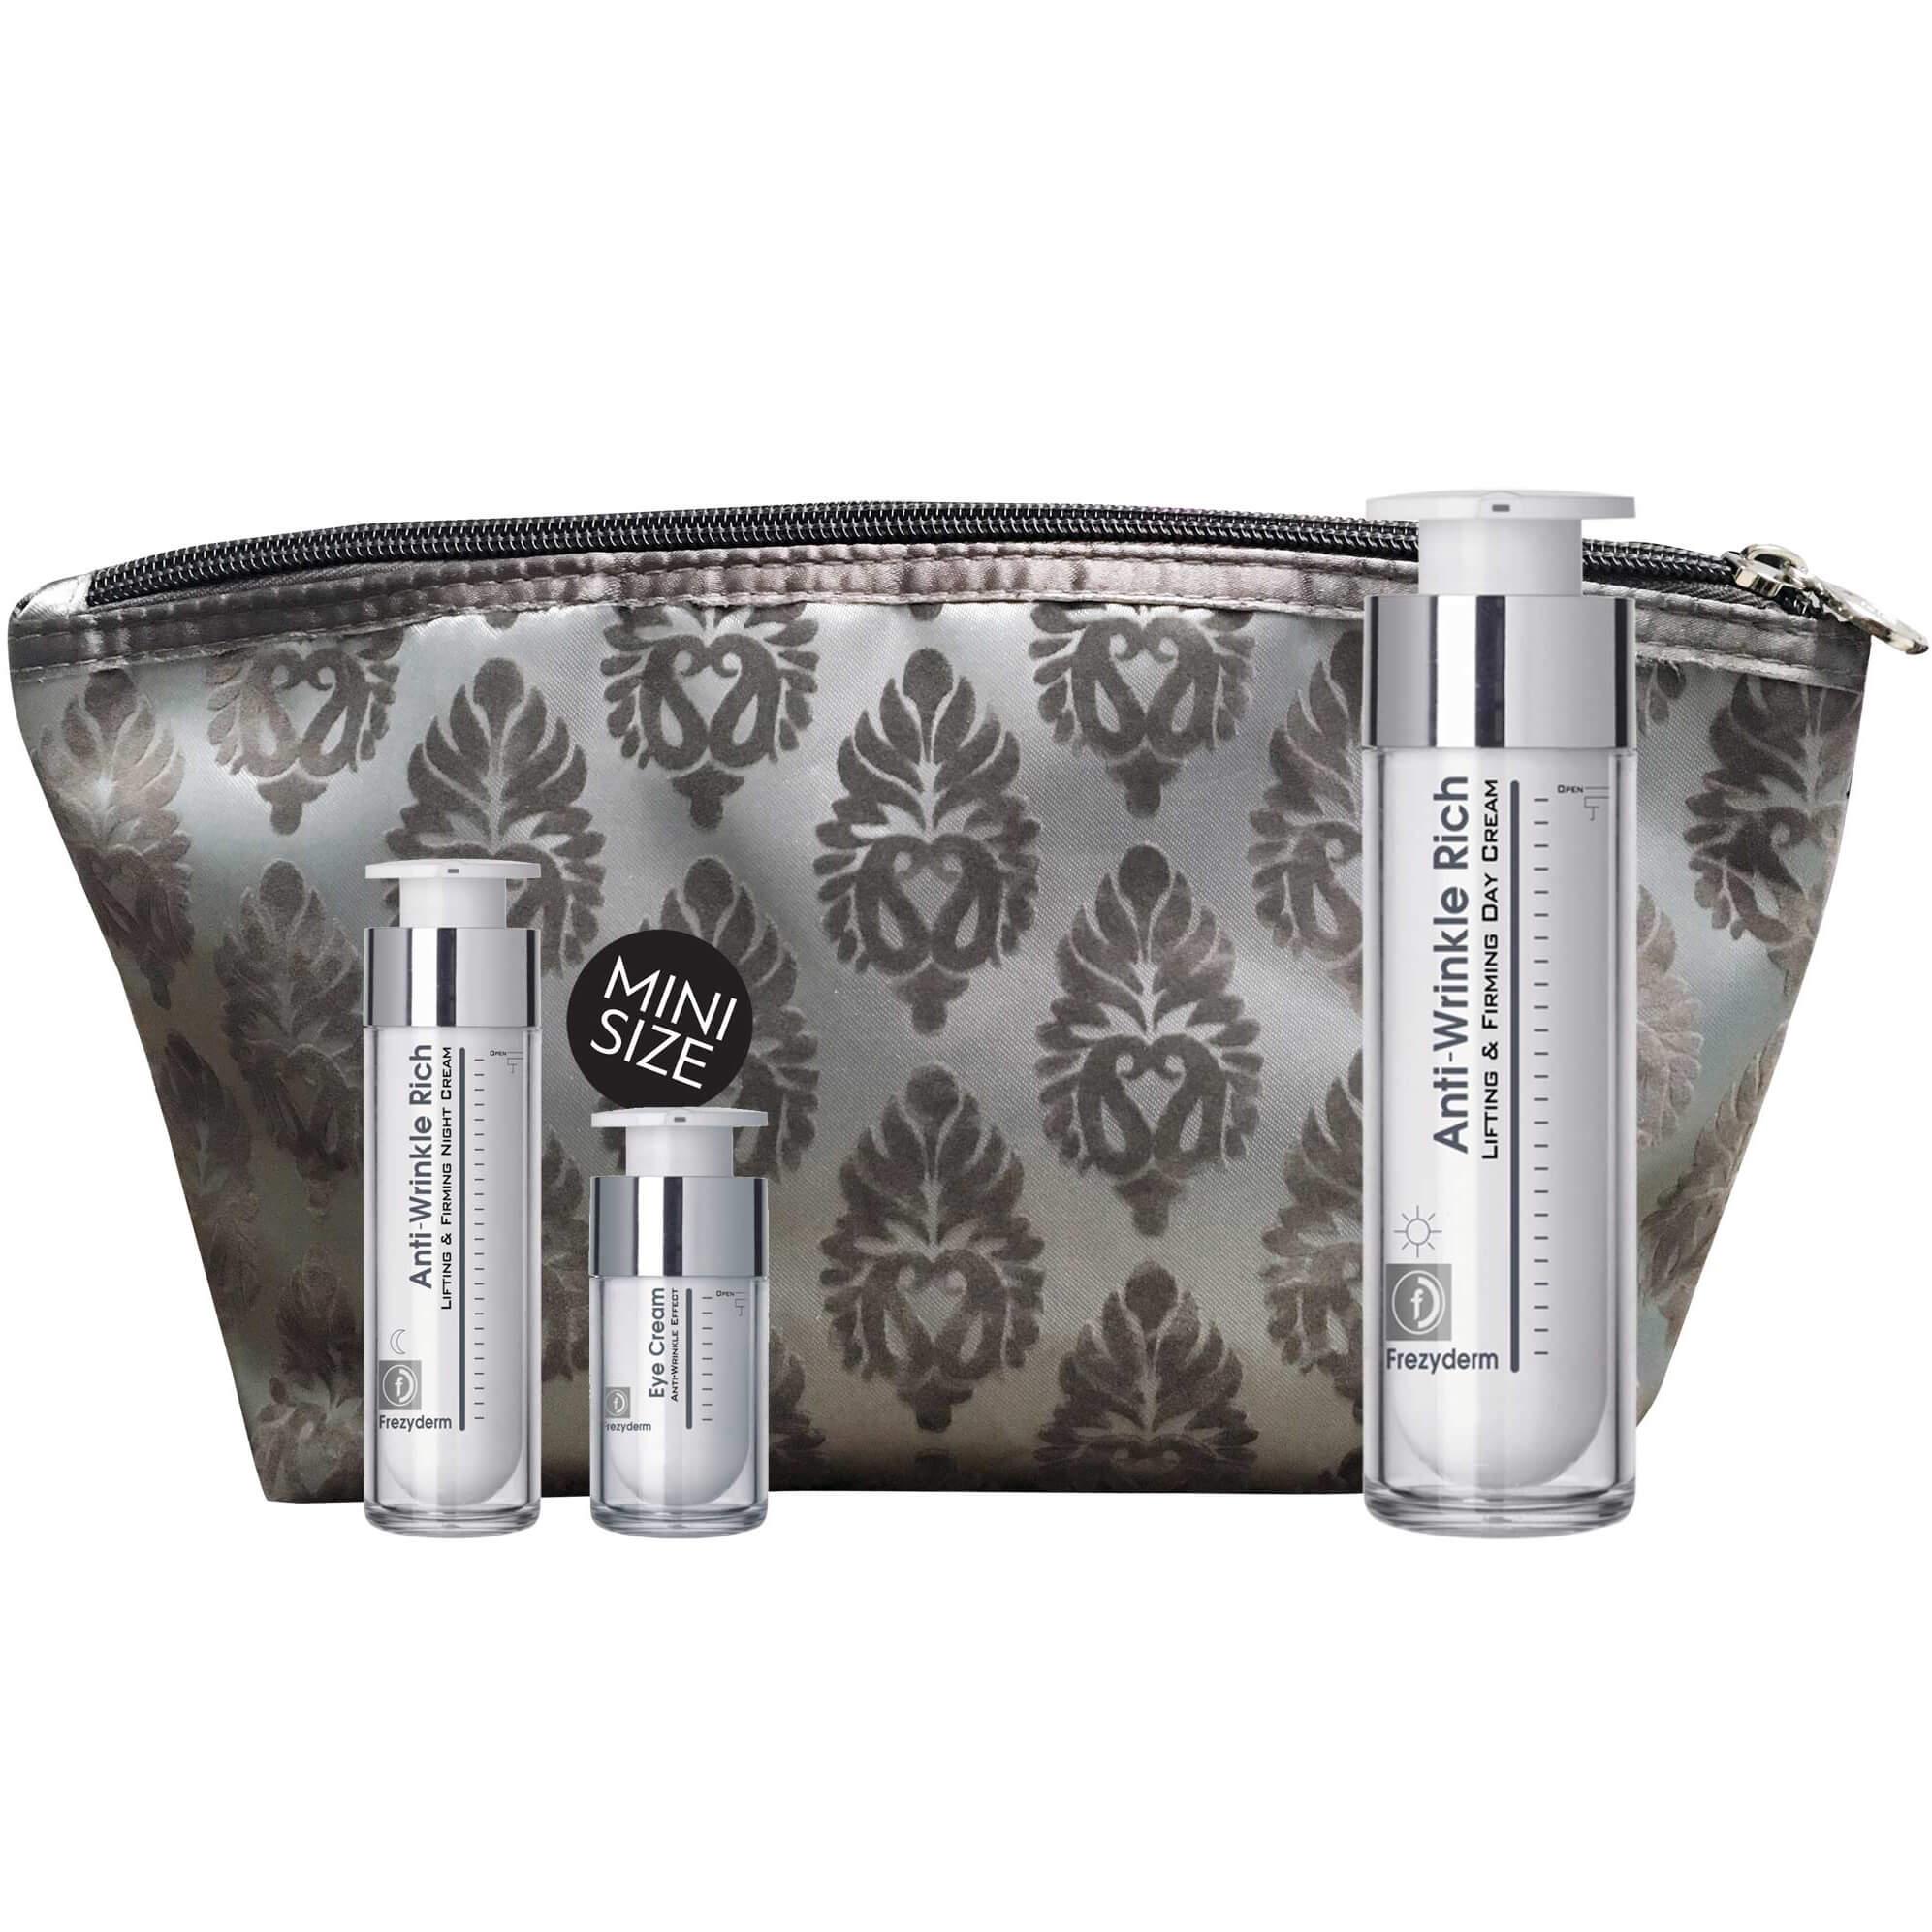 Frezyderm Πακέτο Προσφοράς Anti-Wrinkle Rich Day Cream 50ml & Δώρο Anti-Wrinkle Rich Night Cream 15ml & Eye Cream 5ml & Νεσεσέρ